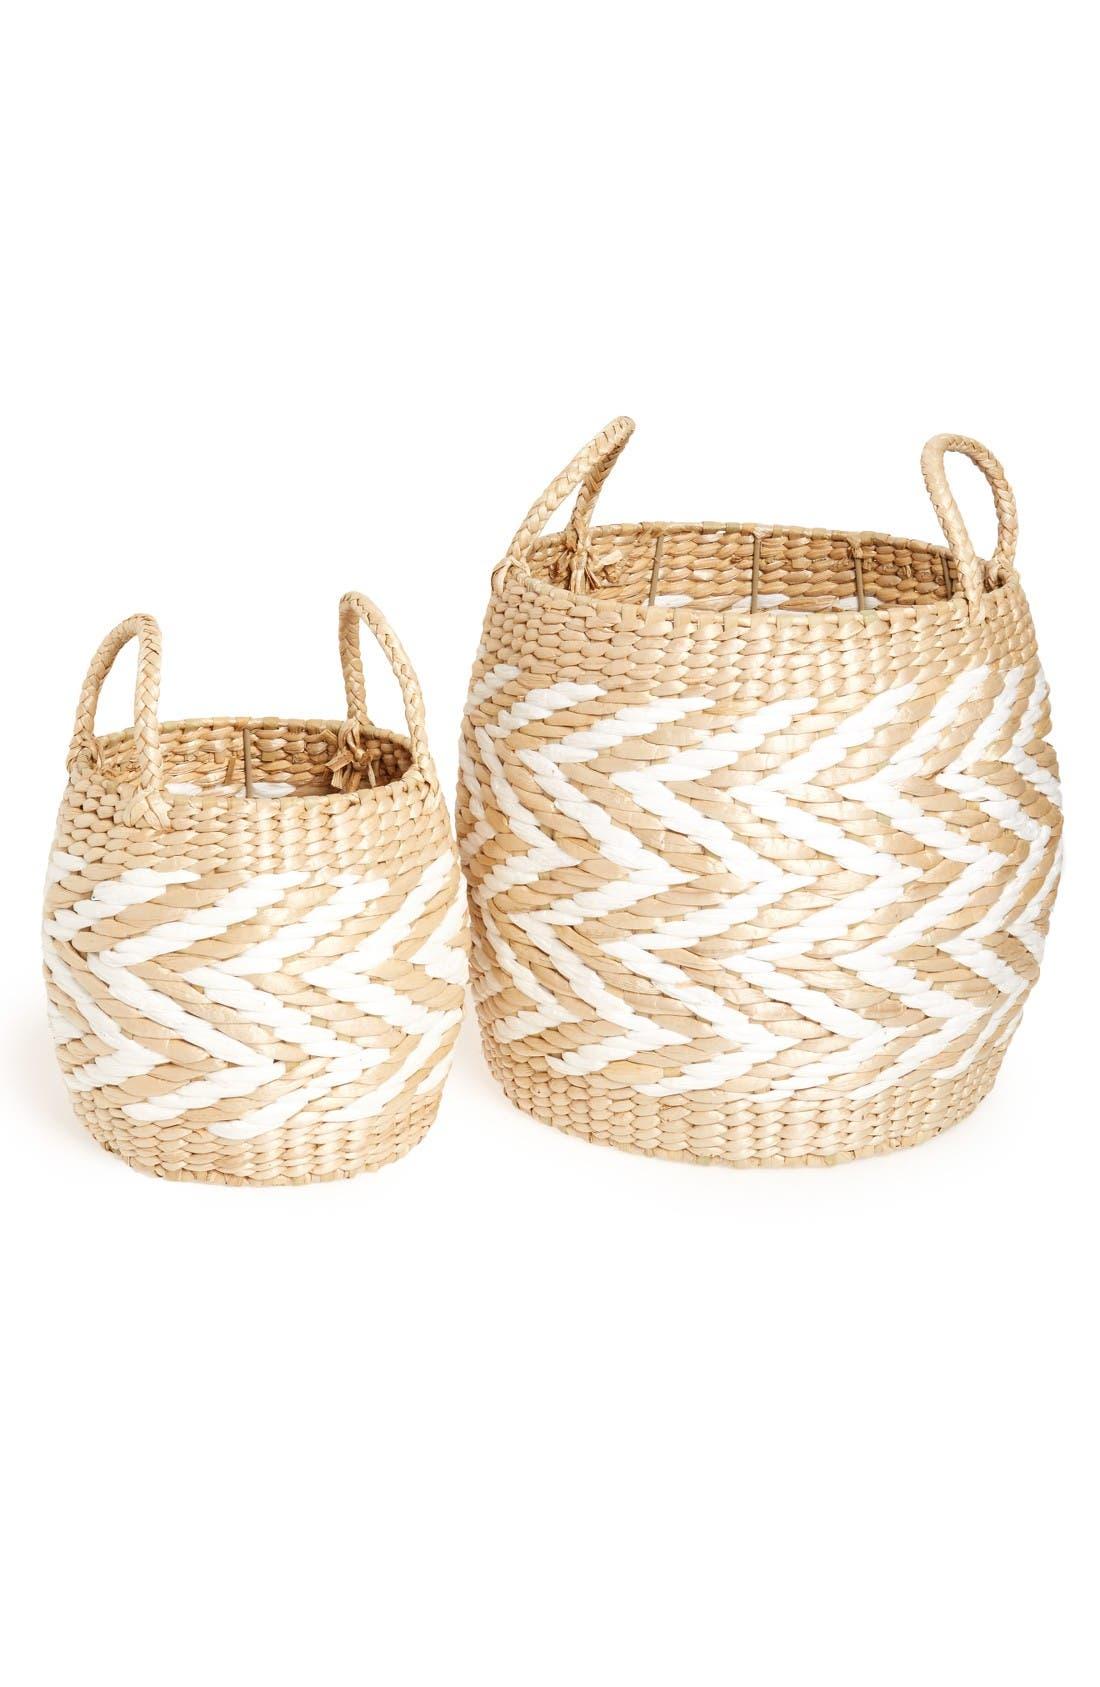 Alternate Image 1 Selected - Levtex Drum Basket